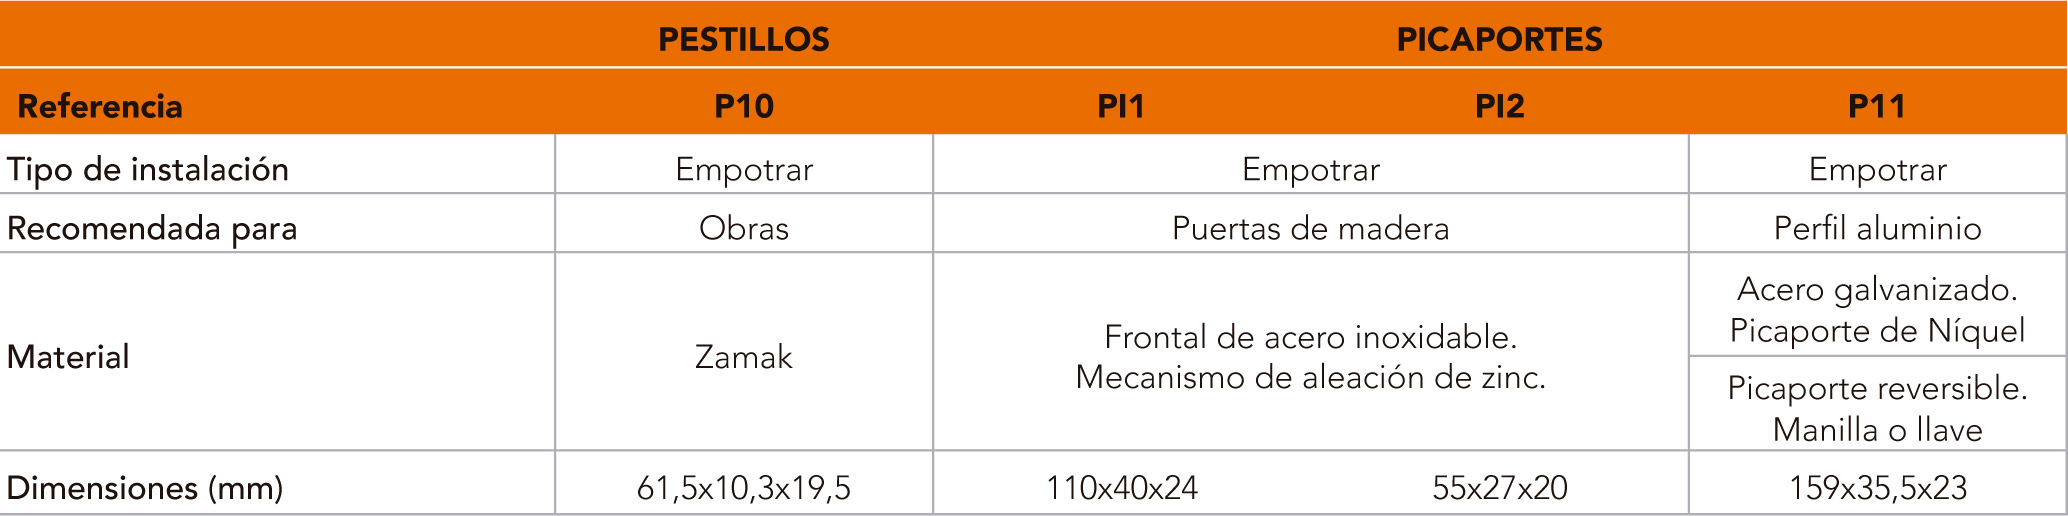 pestillos_caracteristicas